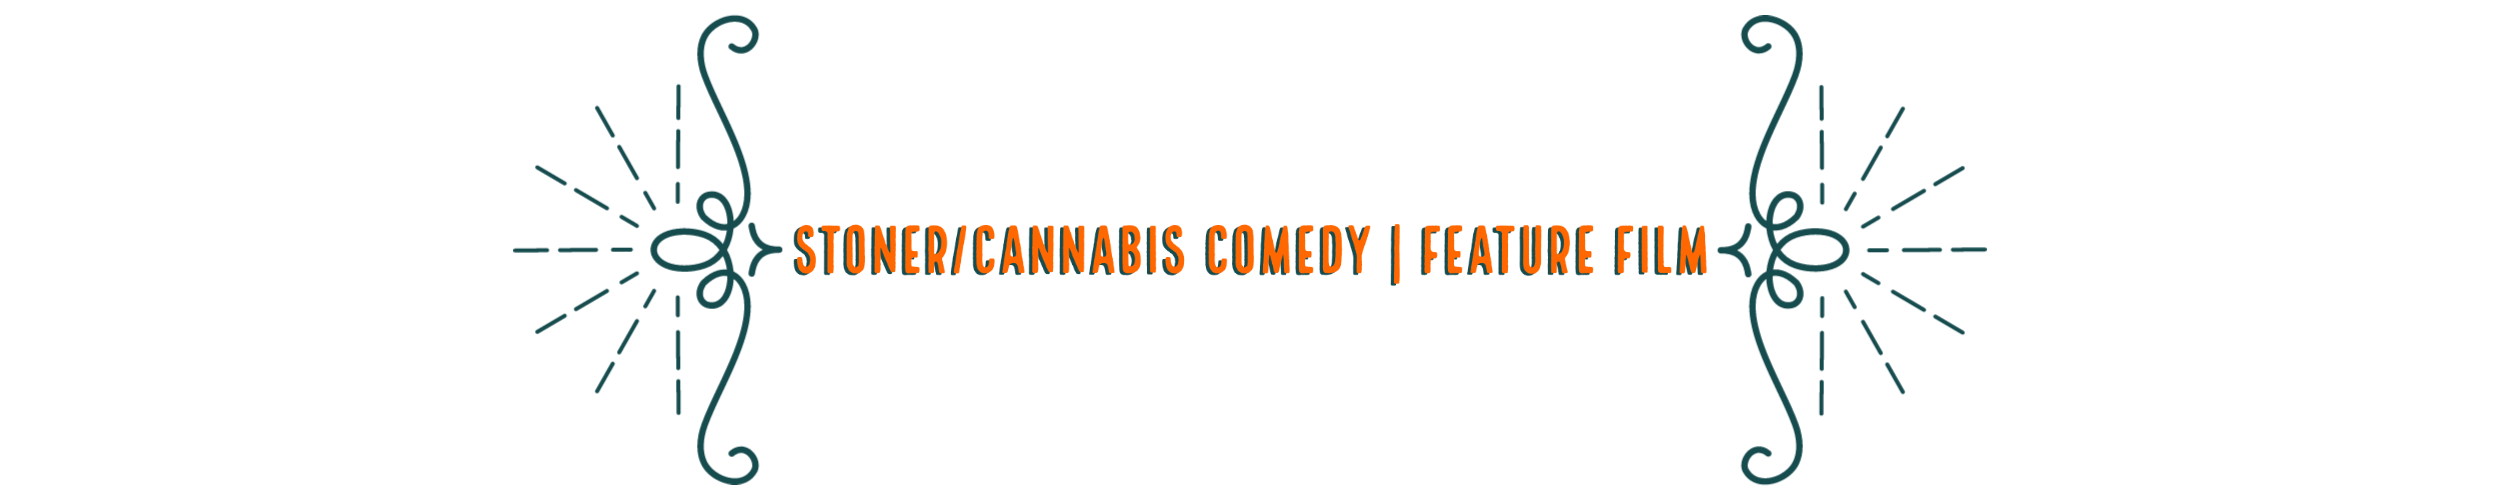 Stoner Cannabis Comedy Short Film